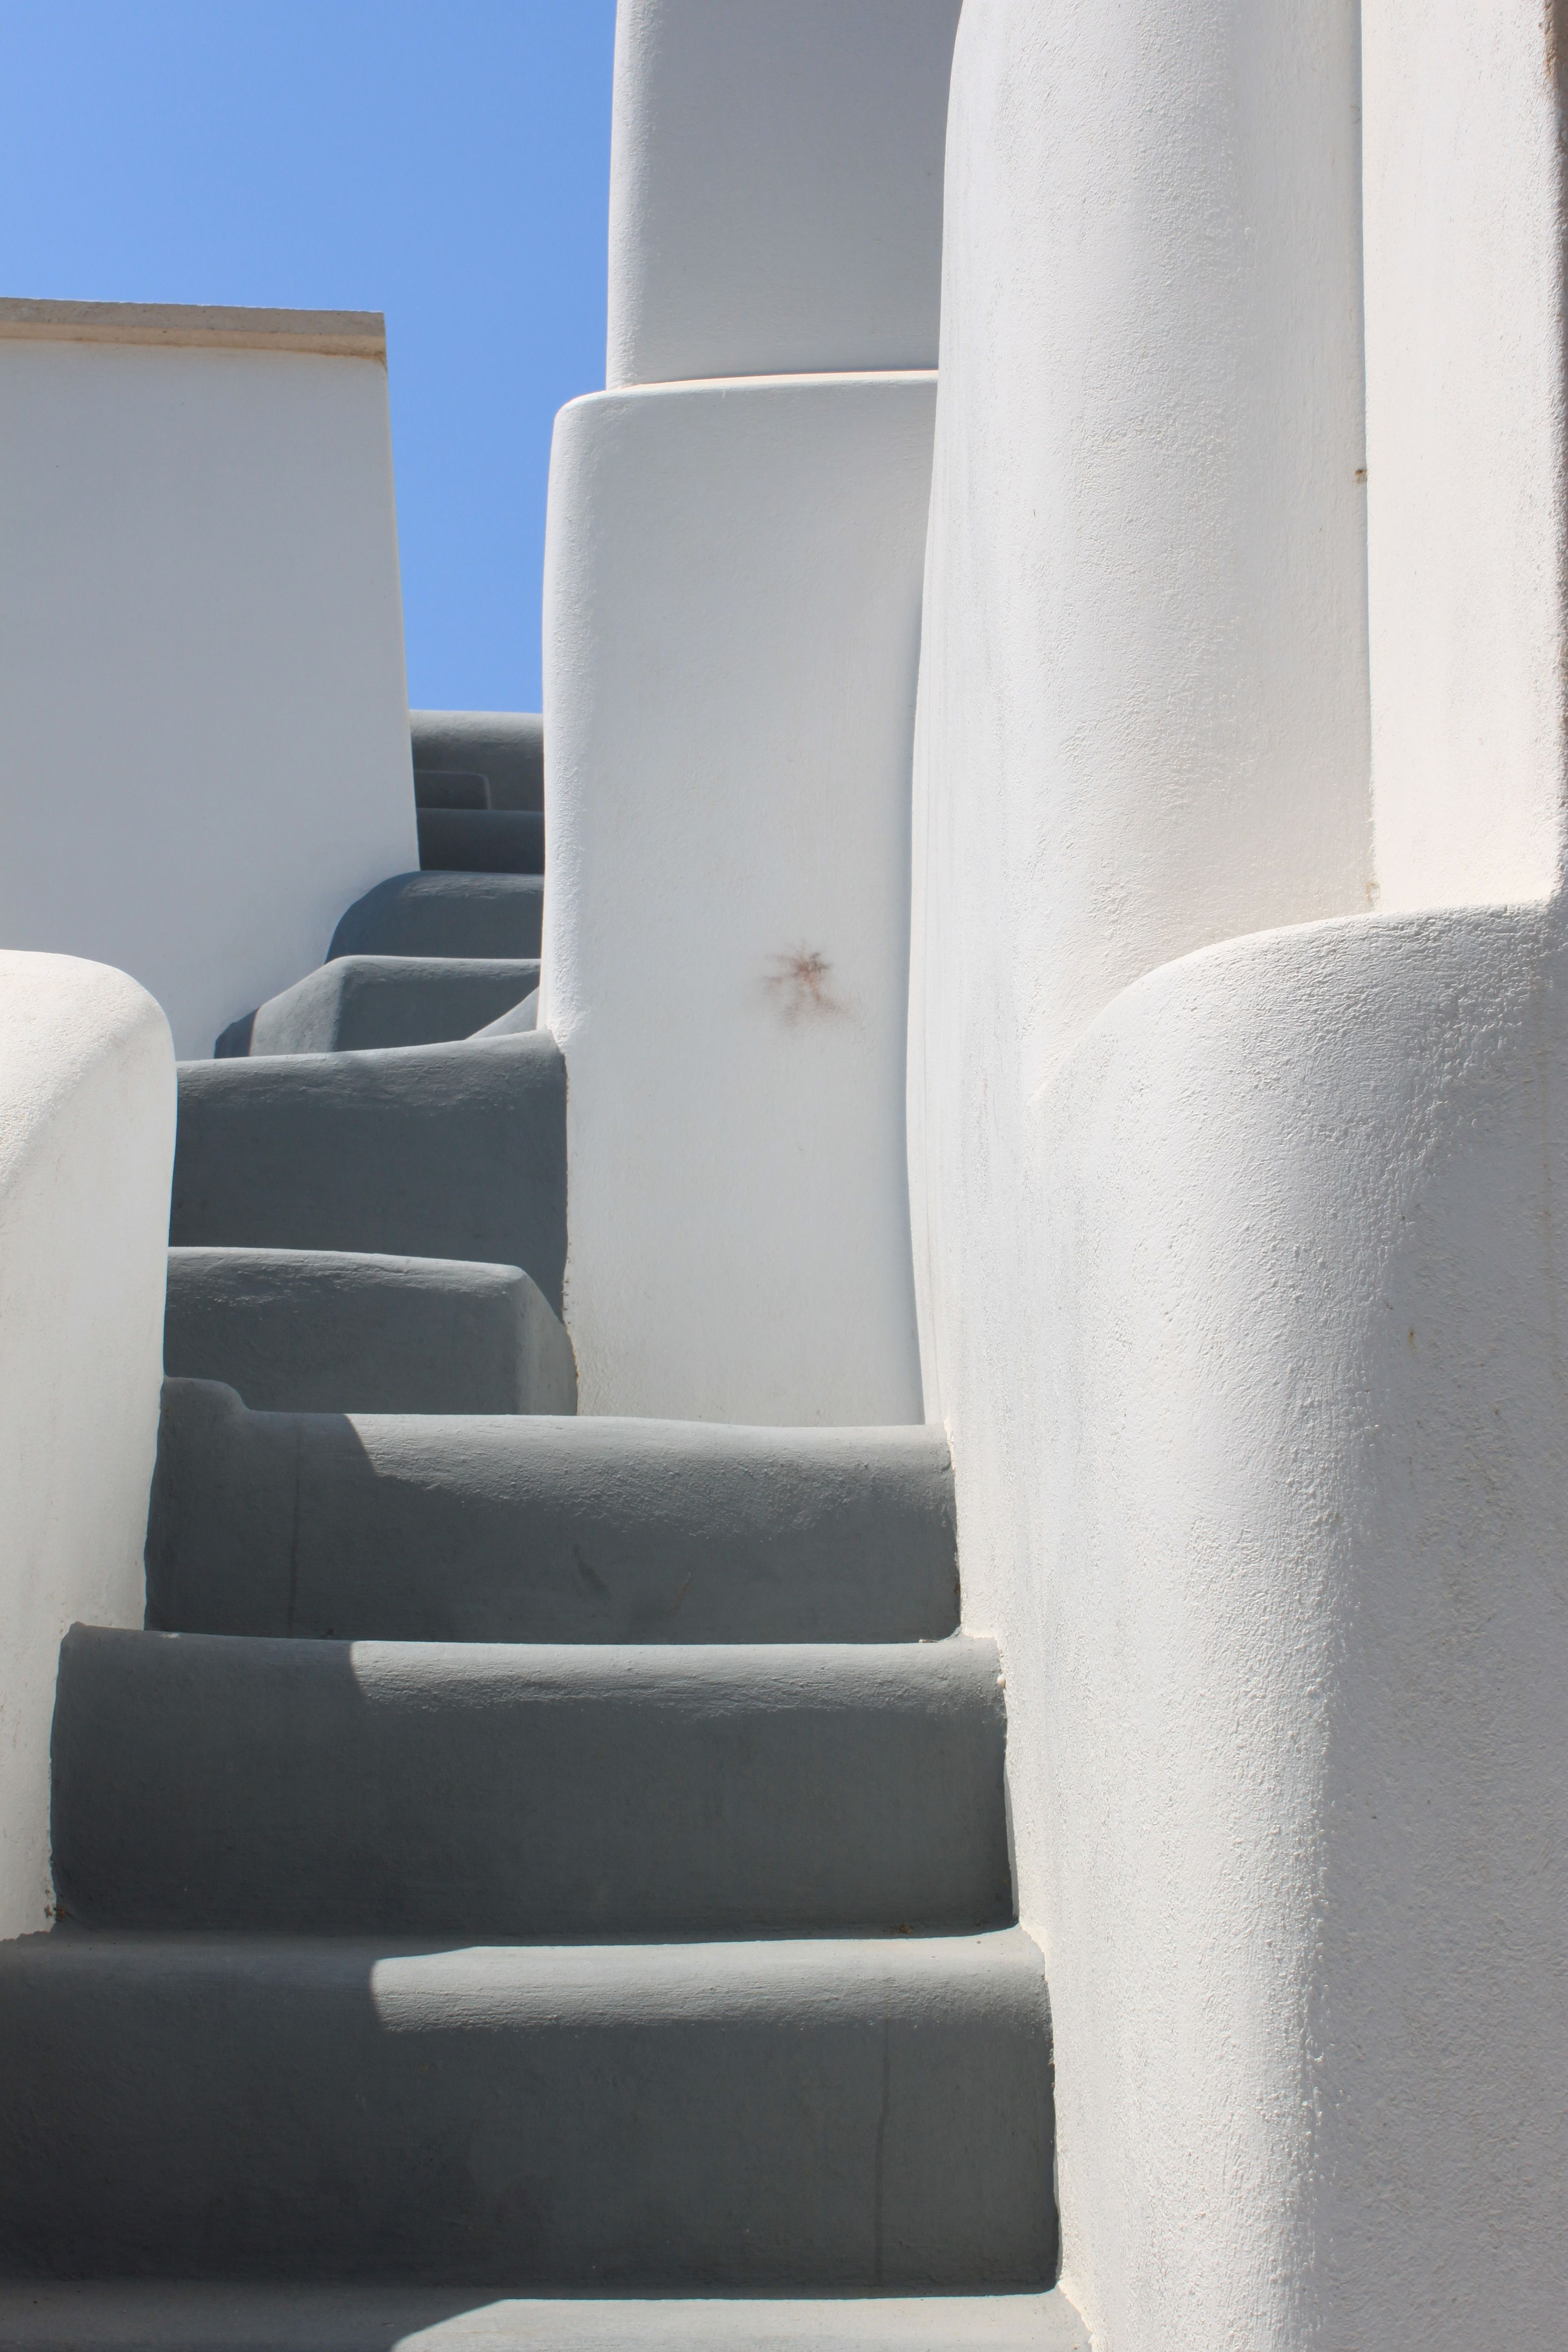 Best Minimal Stairs Minimalism Stairway To Heaven Home Decor 400 x 300